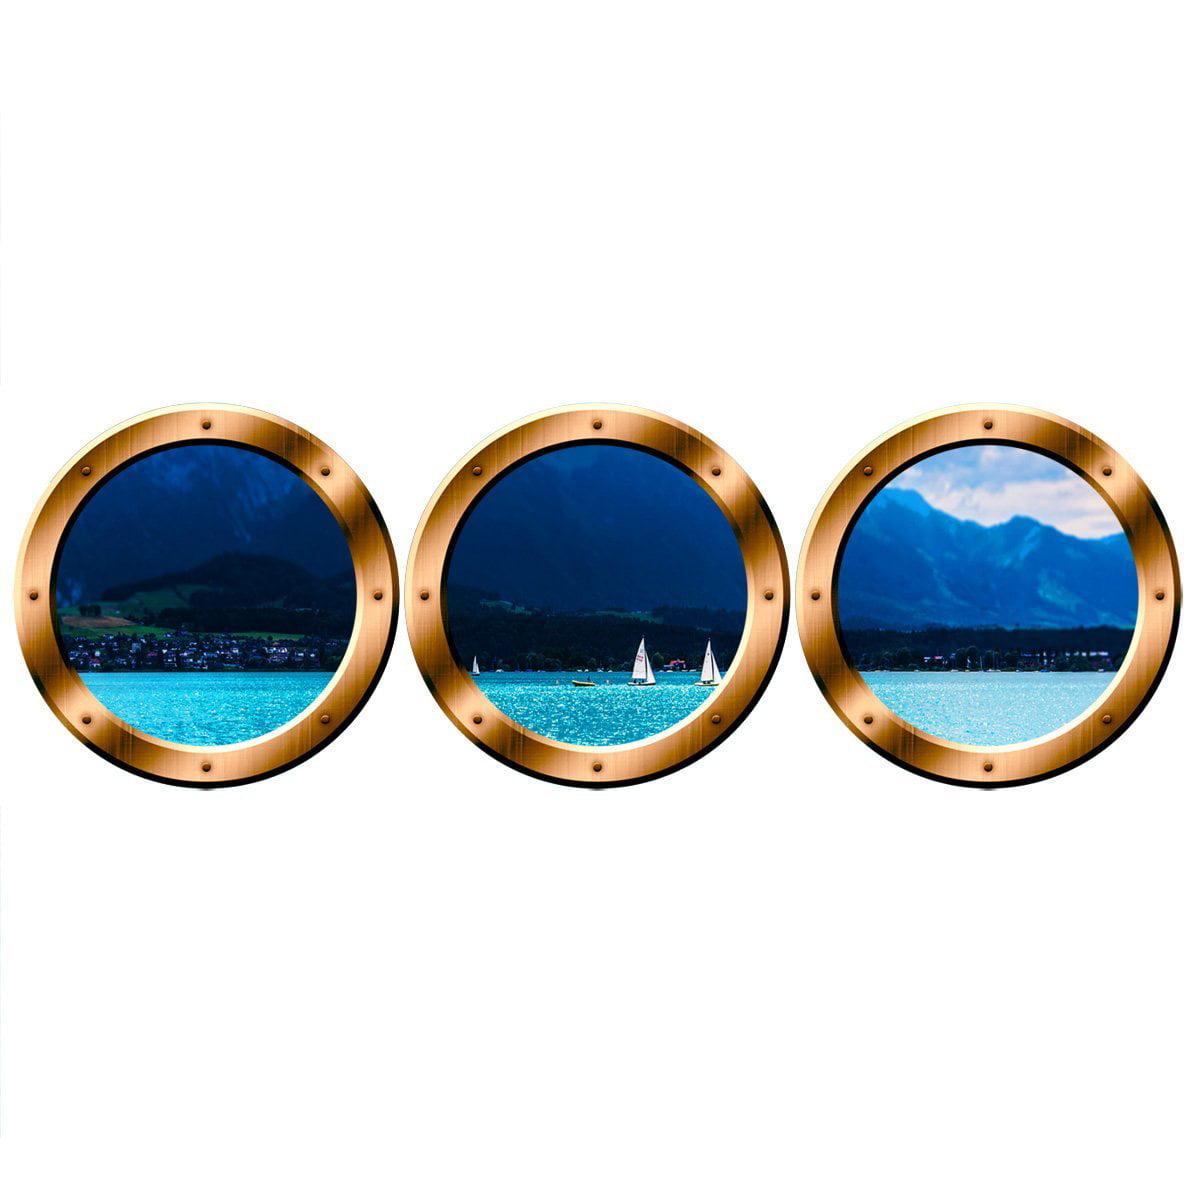 "VWAQ Portholes Decor, Boat Window Decals  Ocean View Wall Mural - VWAQ-SPW3 (20"" Variation, Bronze)"